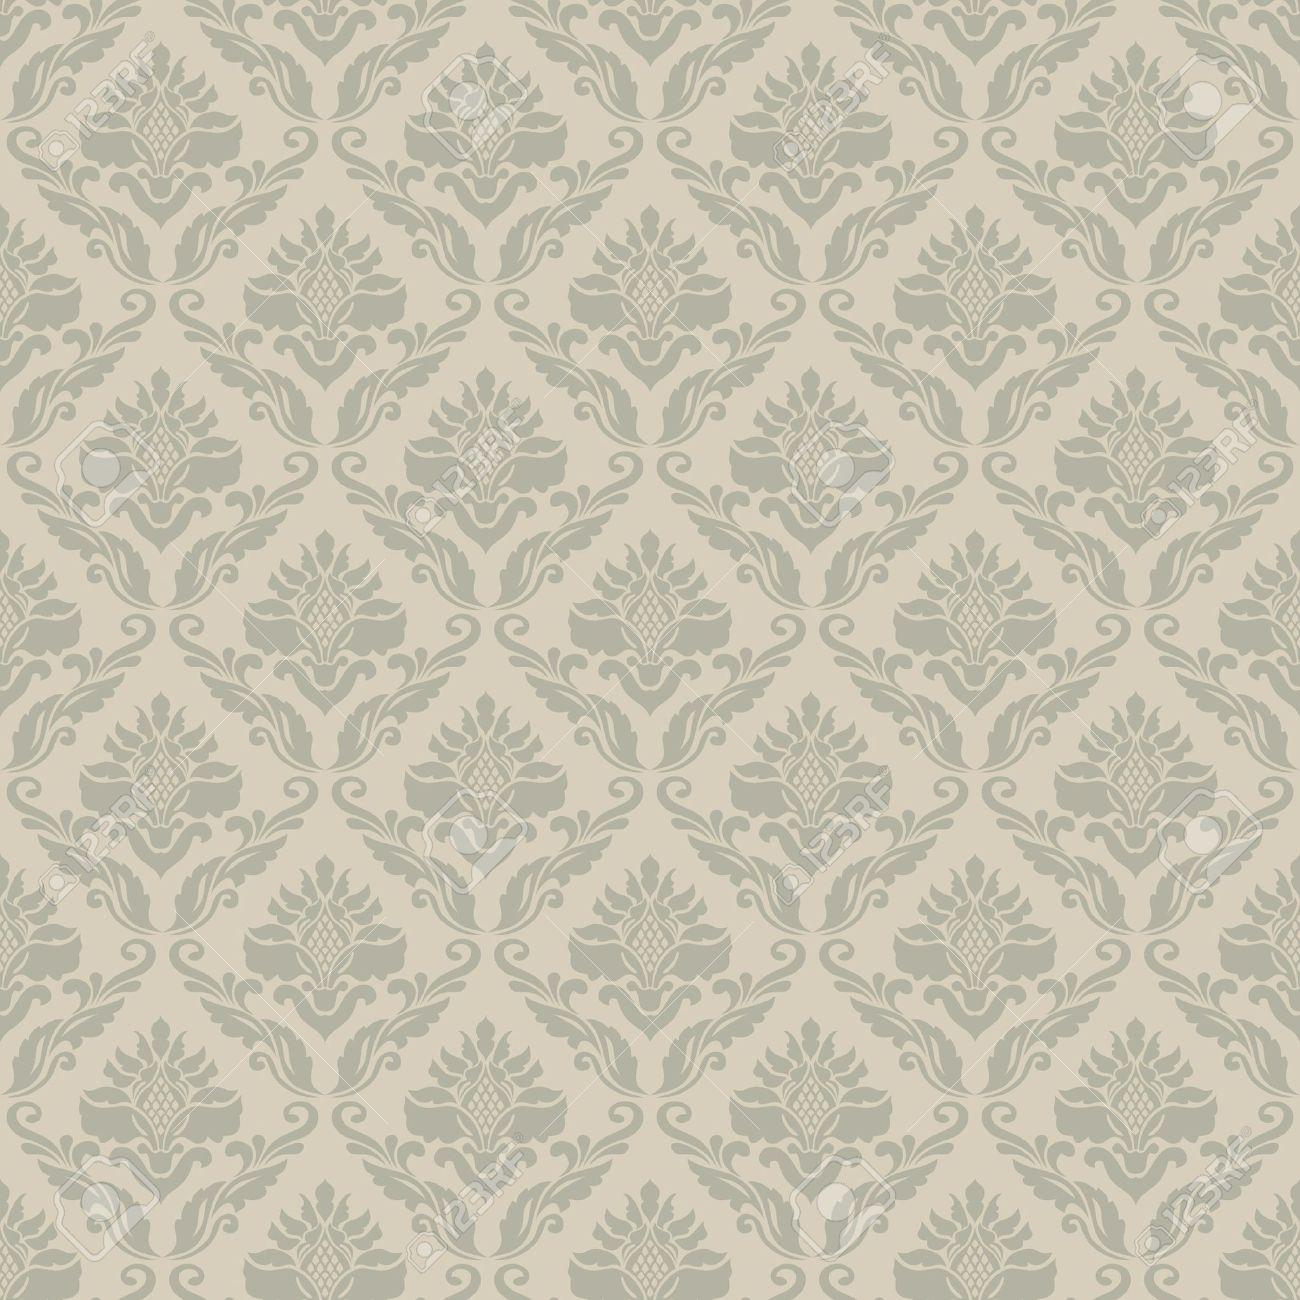 Classic Vintage Seamless Wallpaper Damask Ornmental Pattern